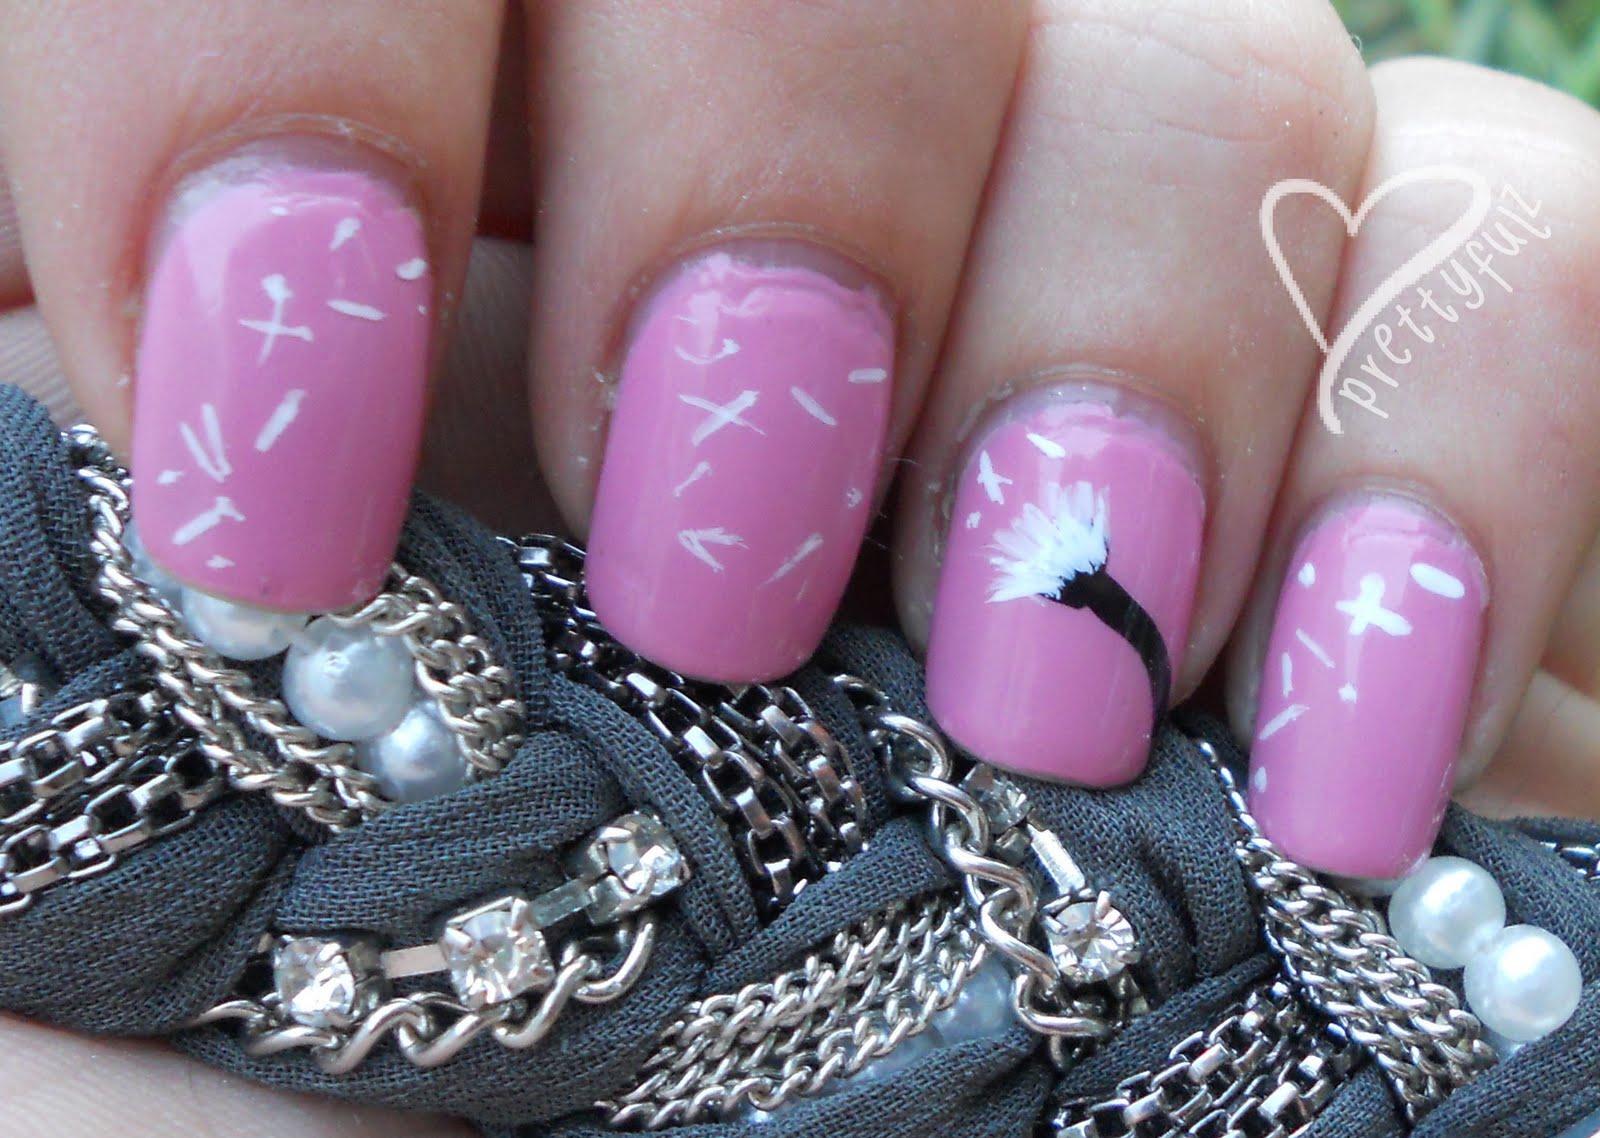 Prettyfulz: Make a wish! Dandelion Nail Art Design & Tutorial!!